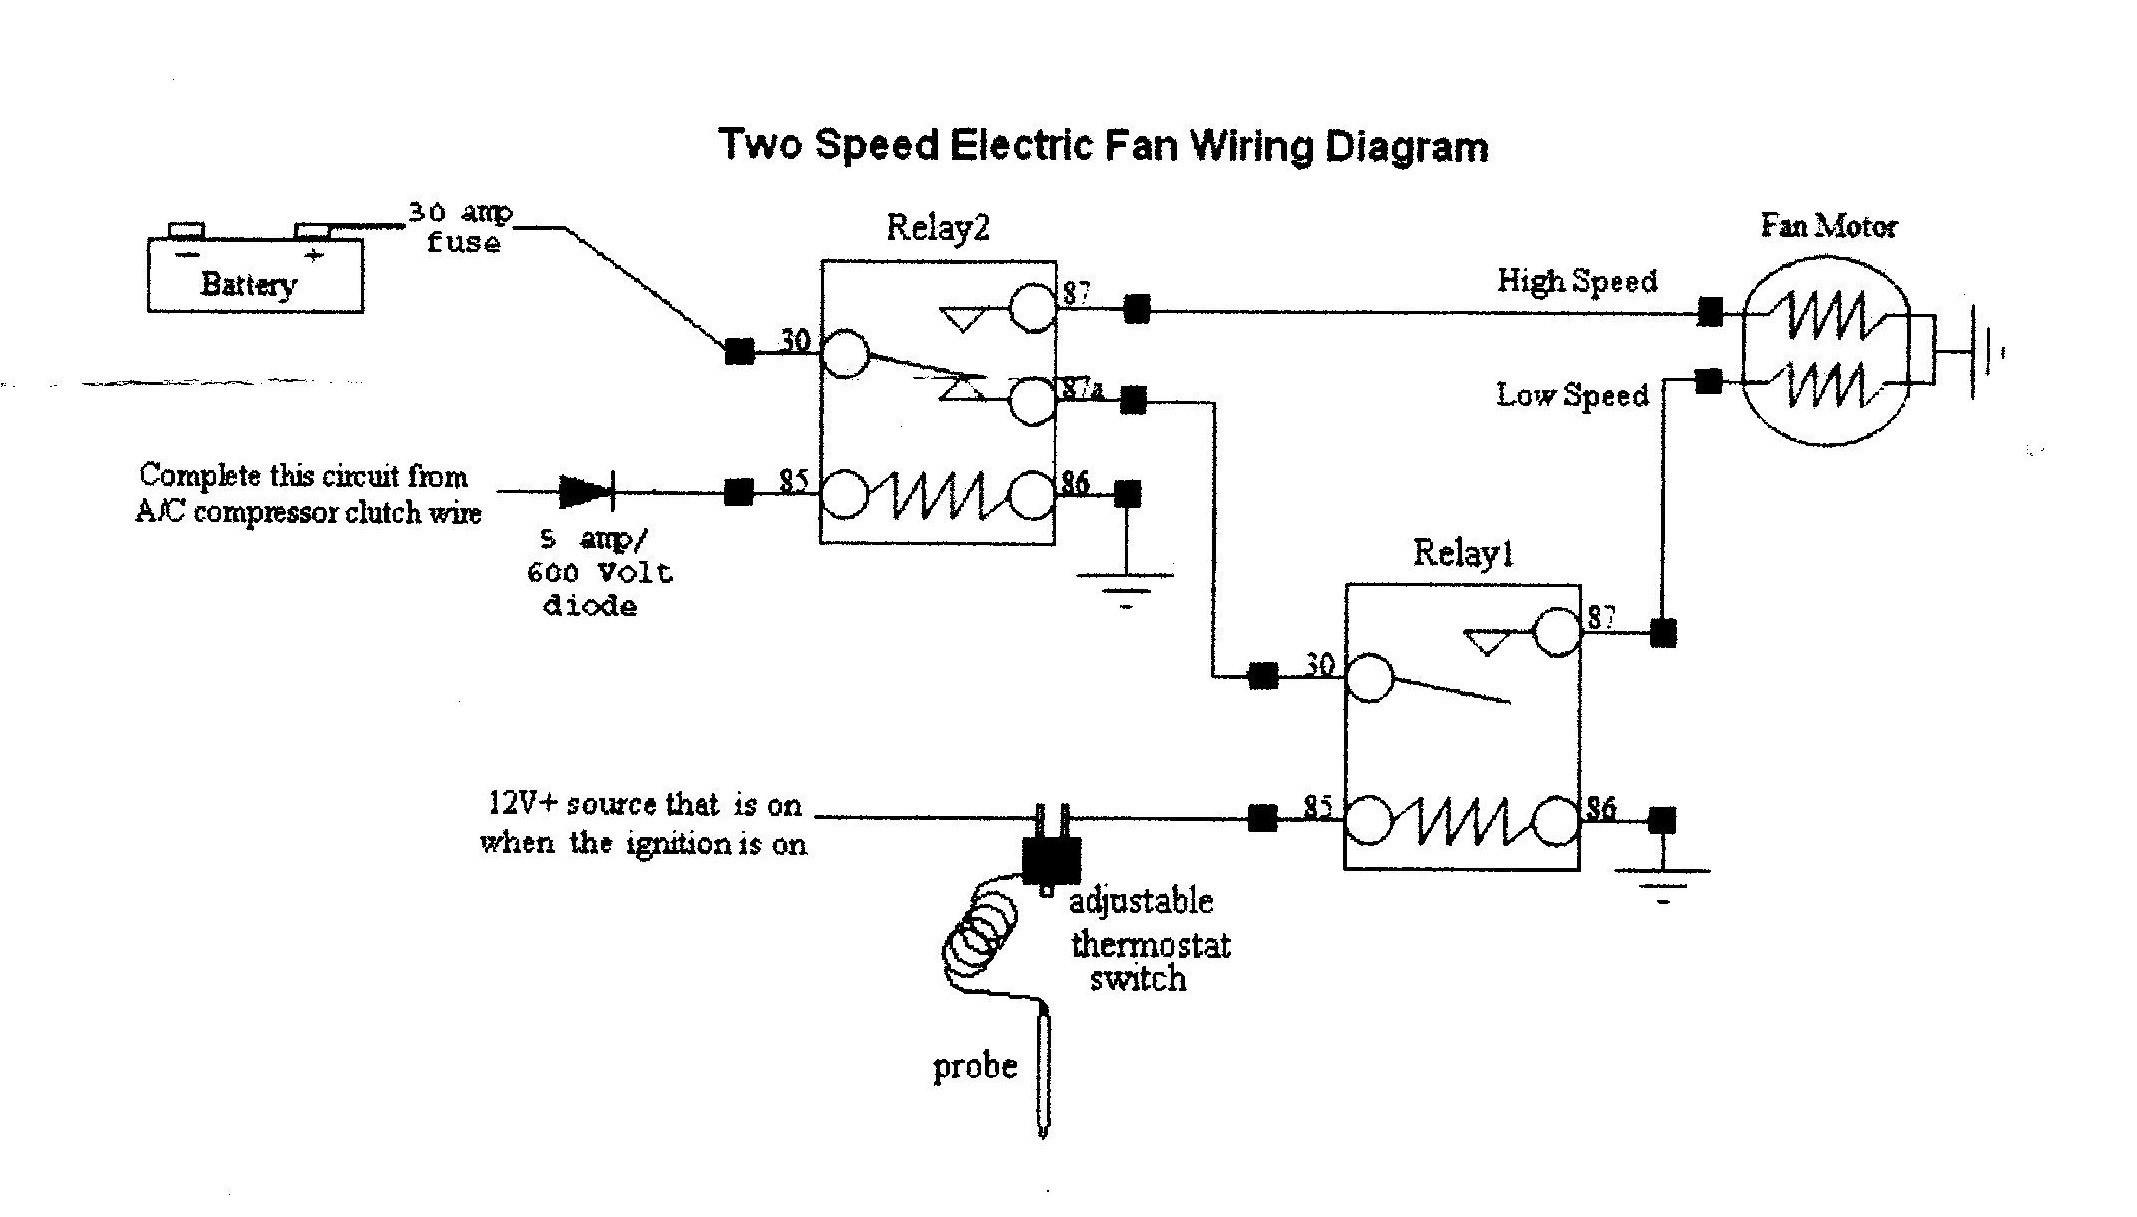 DIAGRAM] Wiring Diagram For 2 Sd Whole House Fan FULL Version HD Quality House  Fan - BPMDIAGRAM.CANTINE-ARGIOLAS.ITCantine-Argiolas.it